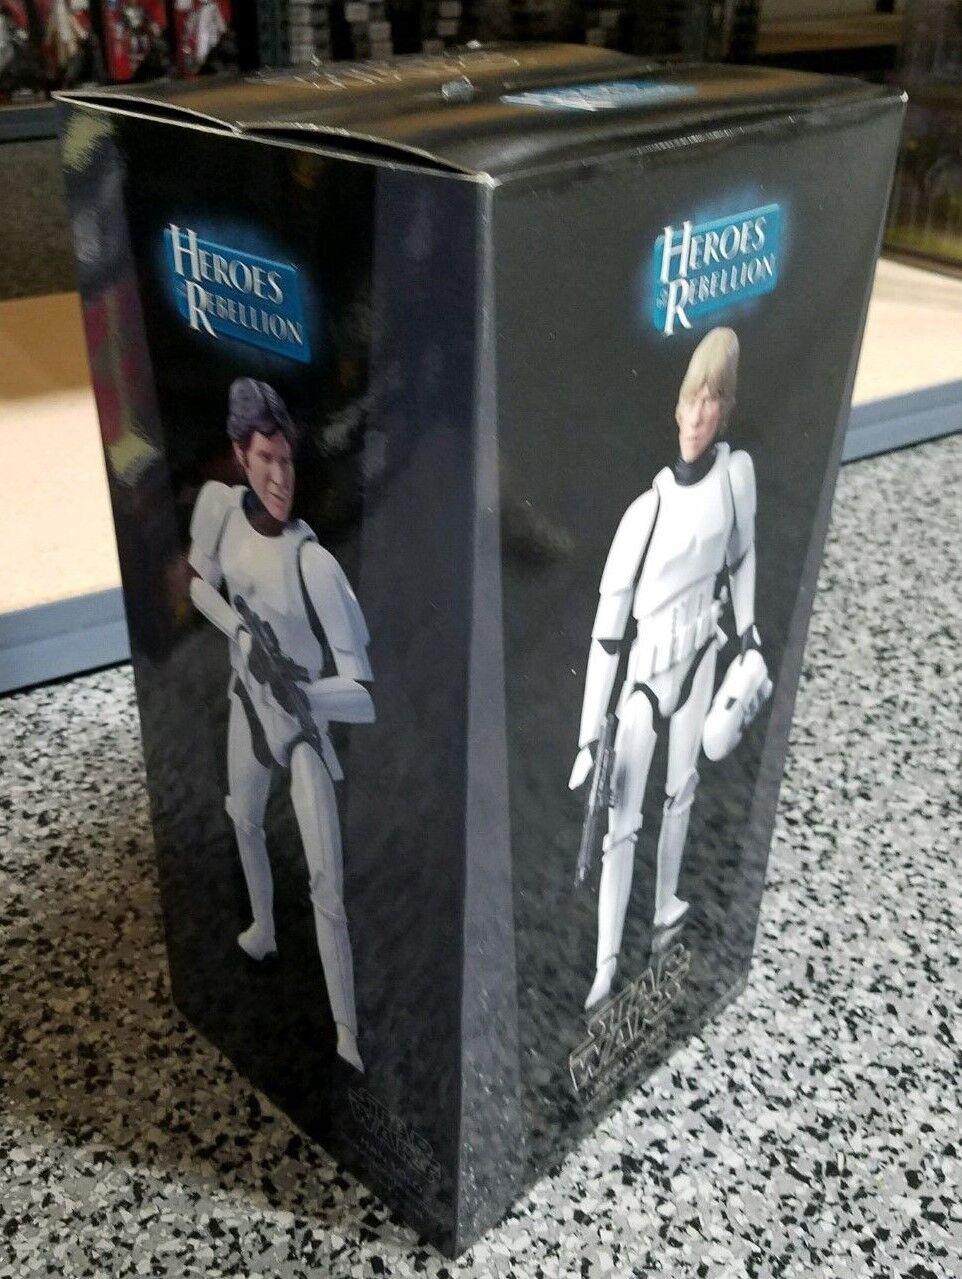 Luke Skywalker and Han Solo Stormtrooper STAR WARS SIDESHOW 1:6 Scale